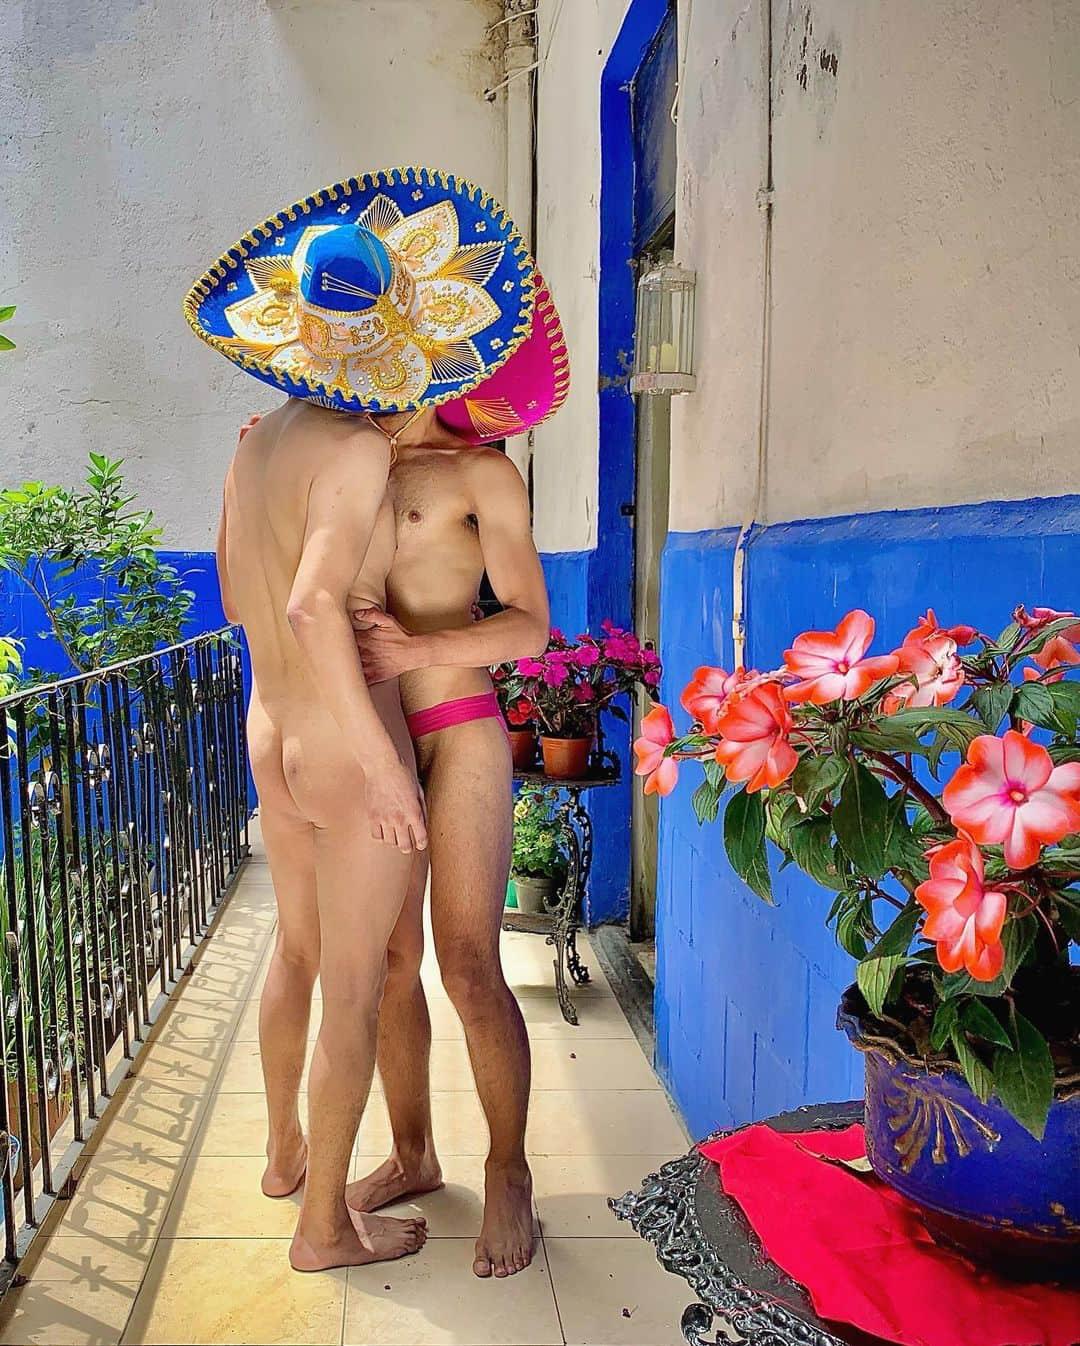 santy mito kissing men